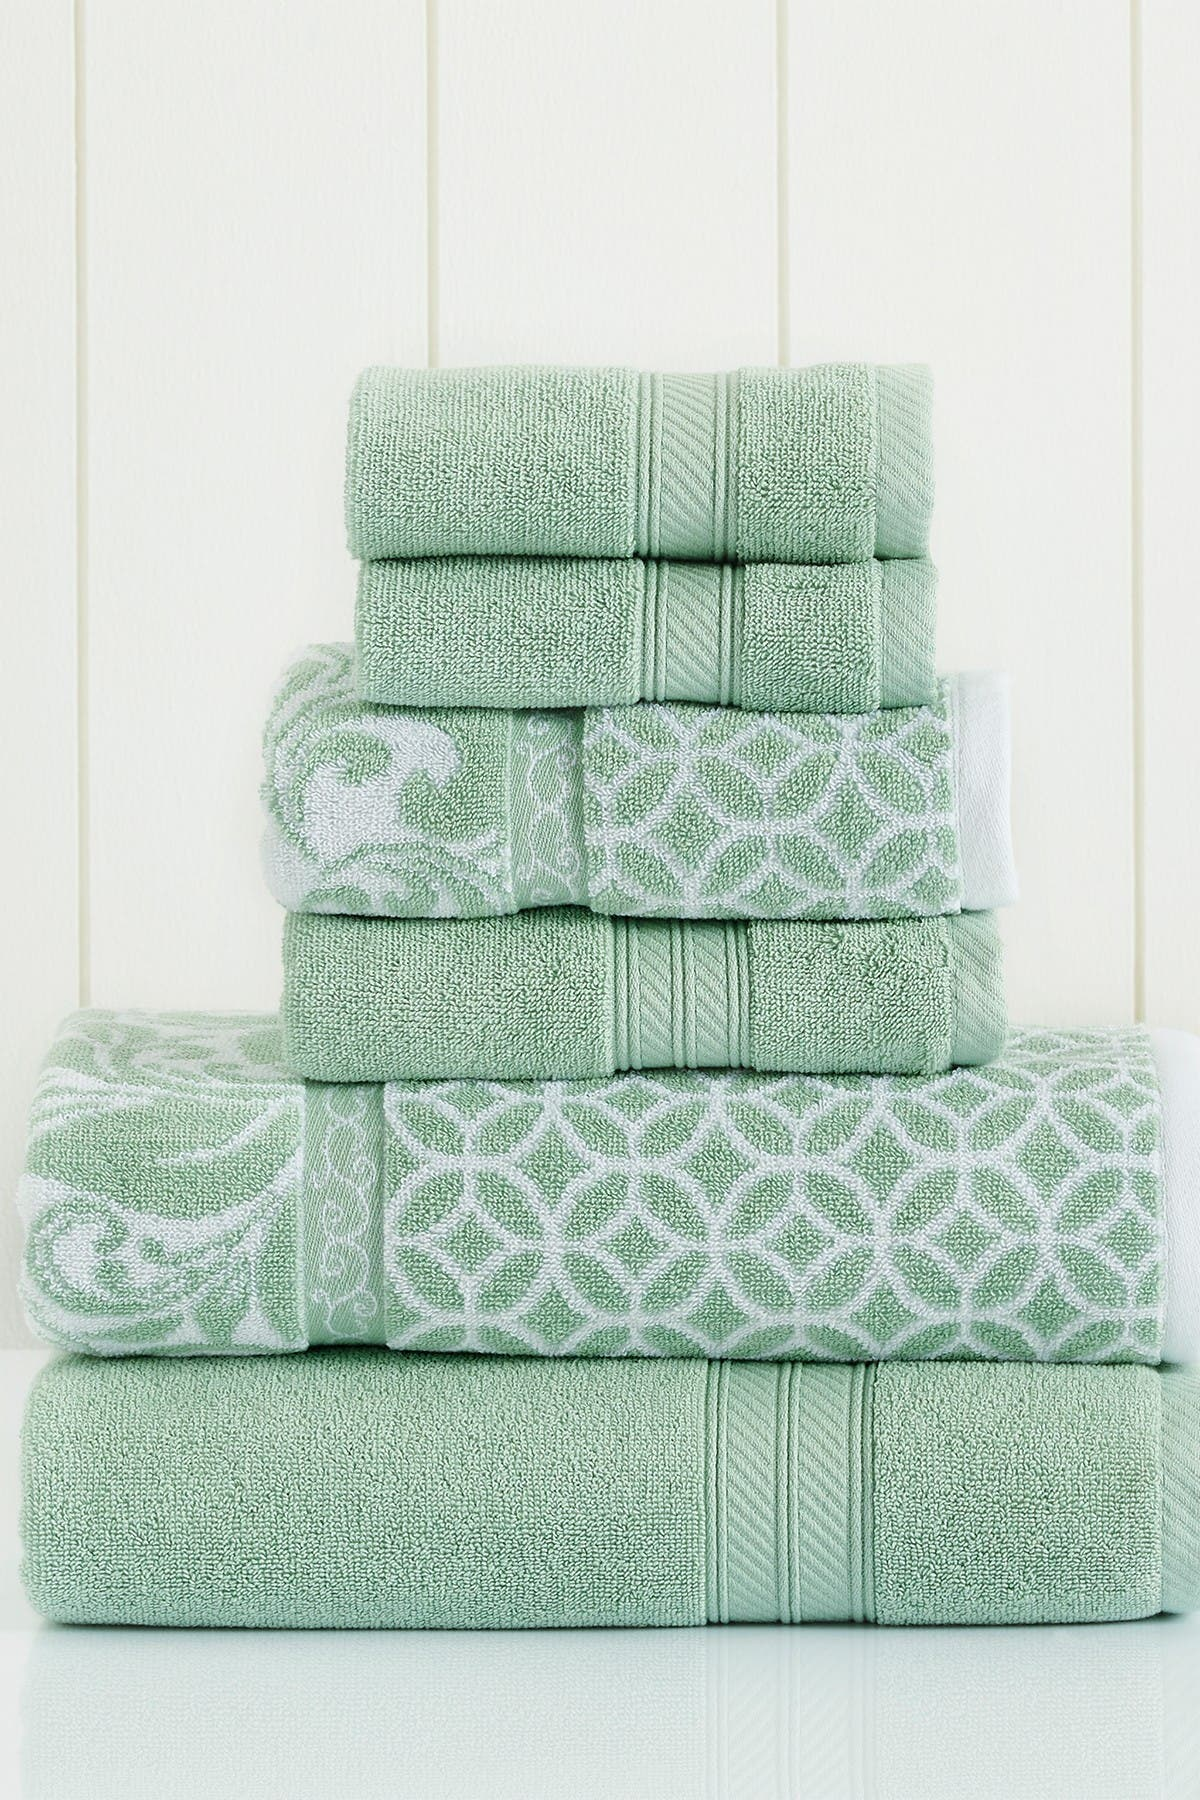 Image of Modern Threads Sage Trefoil Filigree Reversible Yarn-Dyed Jacquard 6-Piece Towel Set